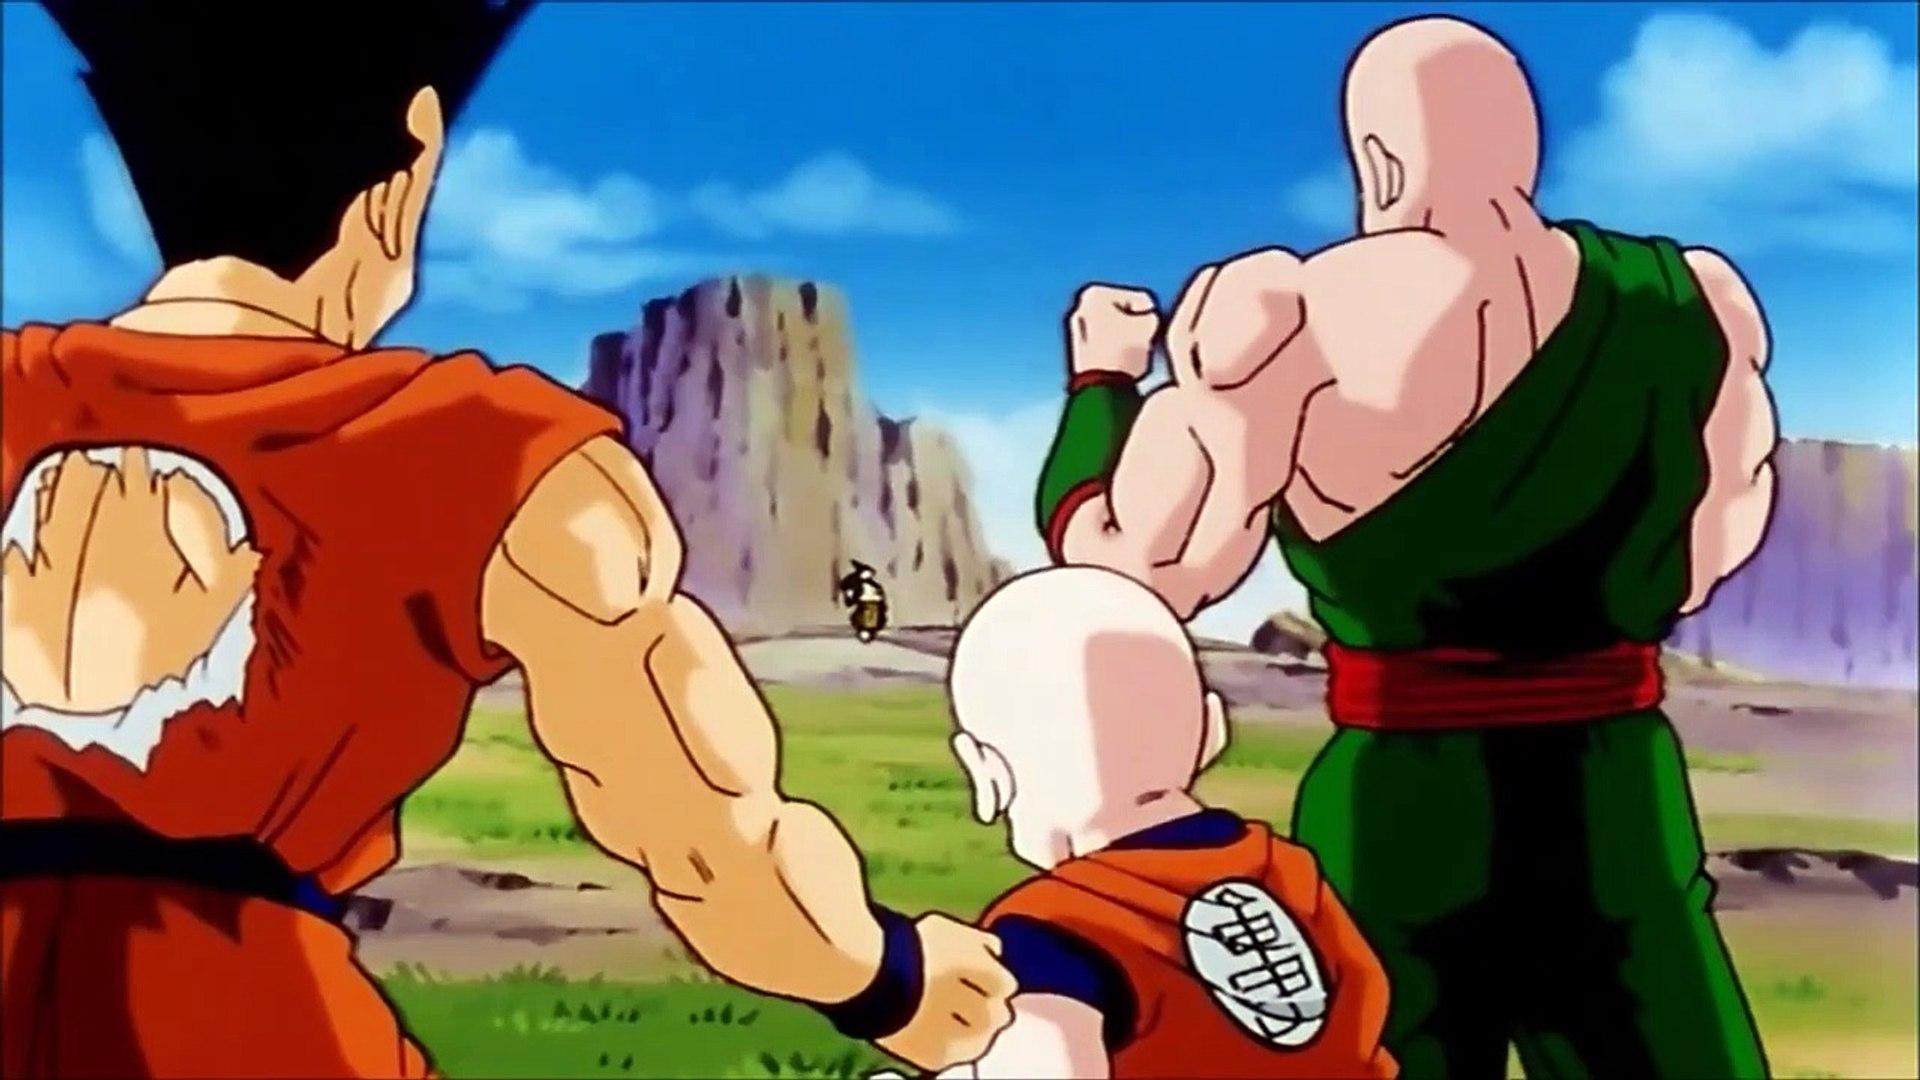 Goku Vs Android 19 Full Fight Vegeta Turns Super Saiyan For The